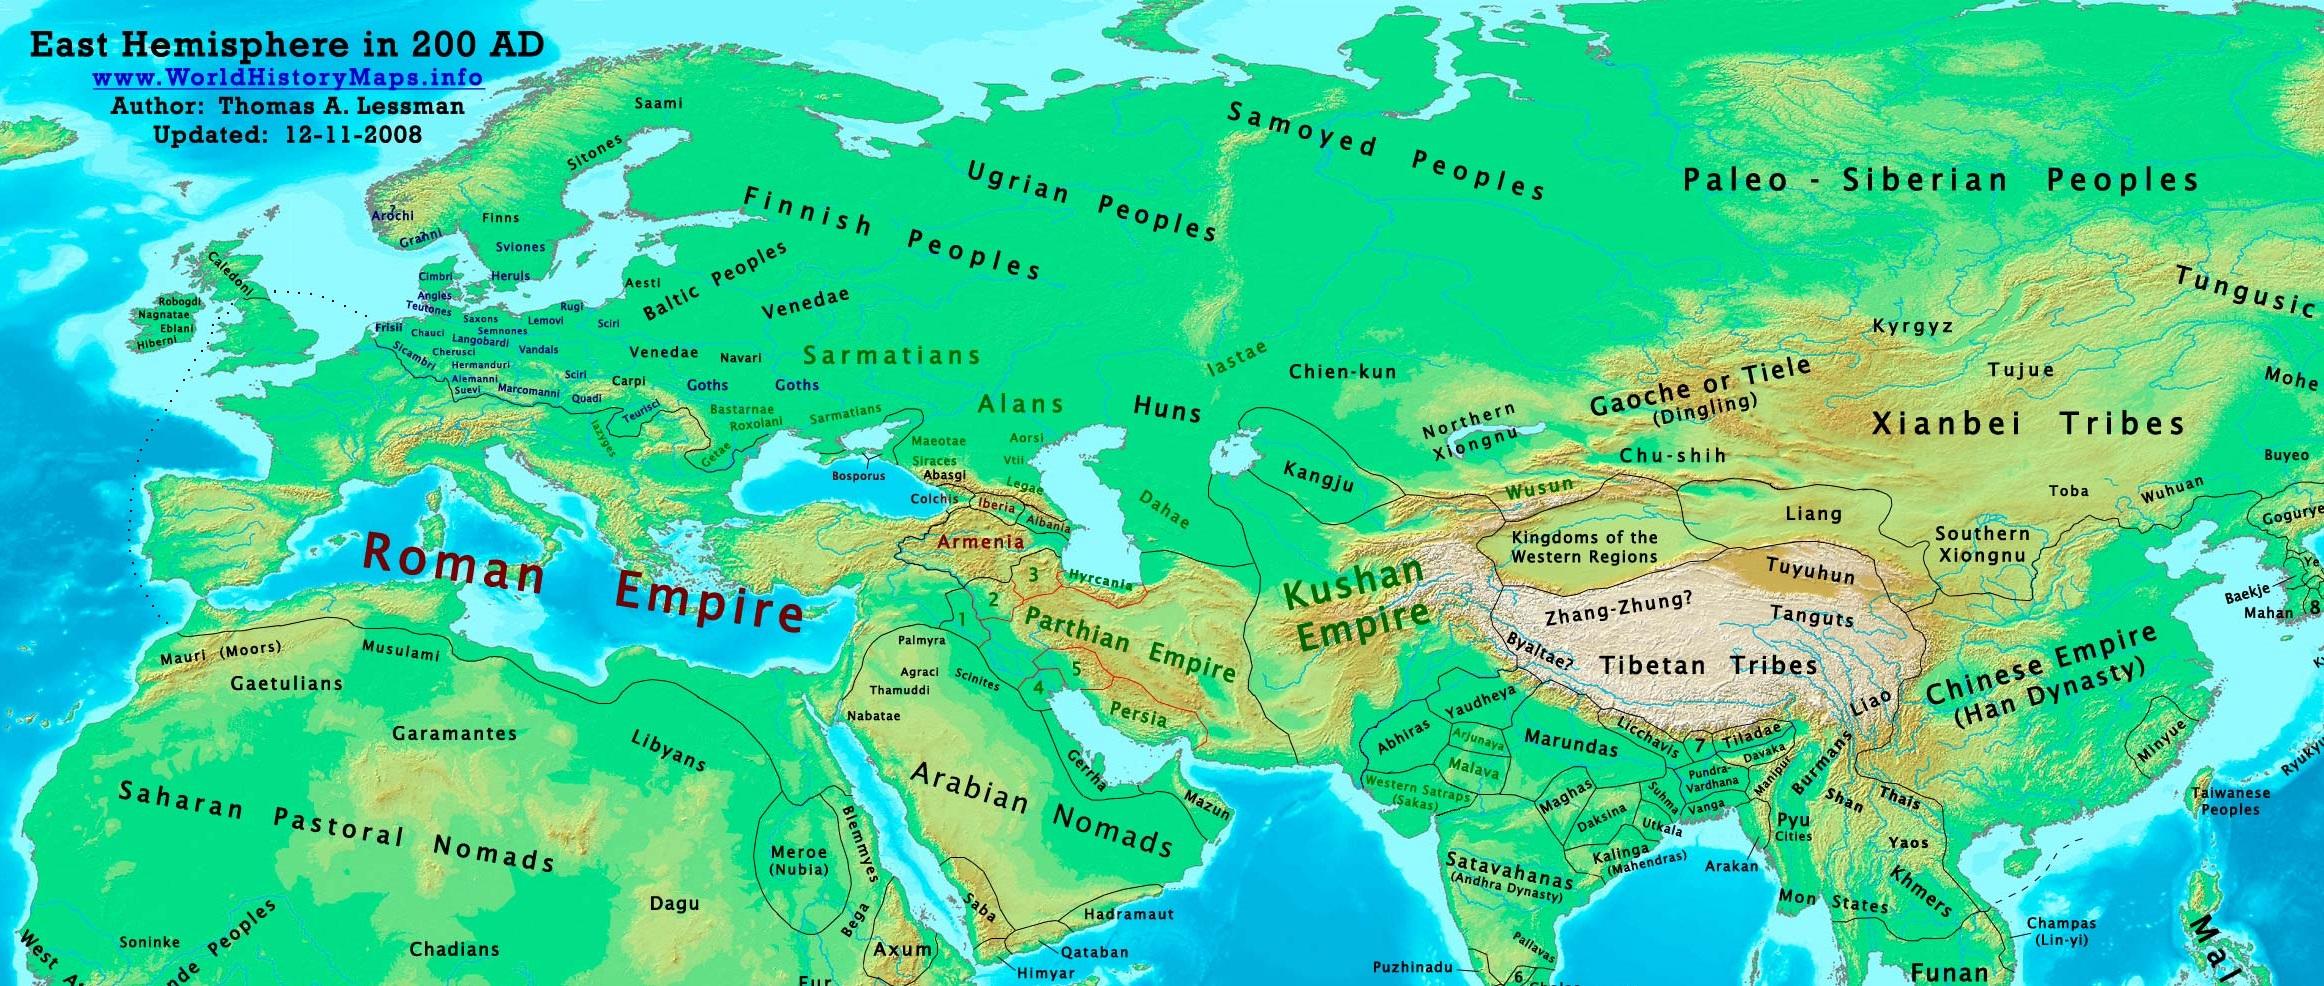 200 AD